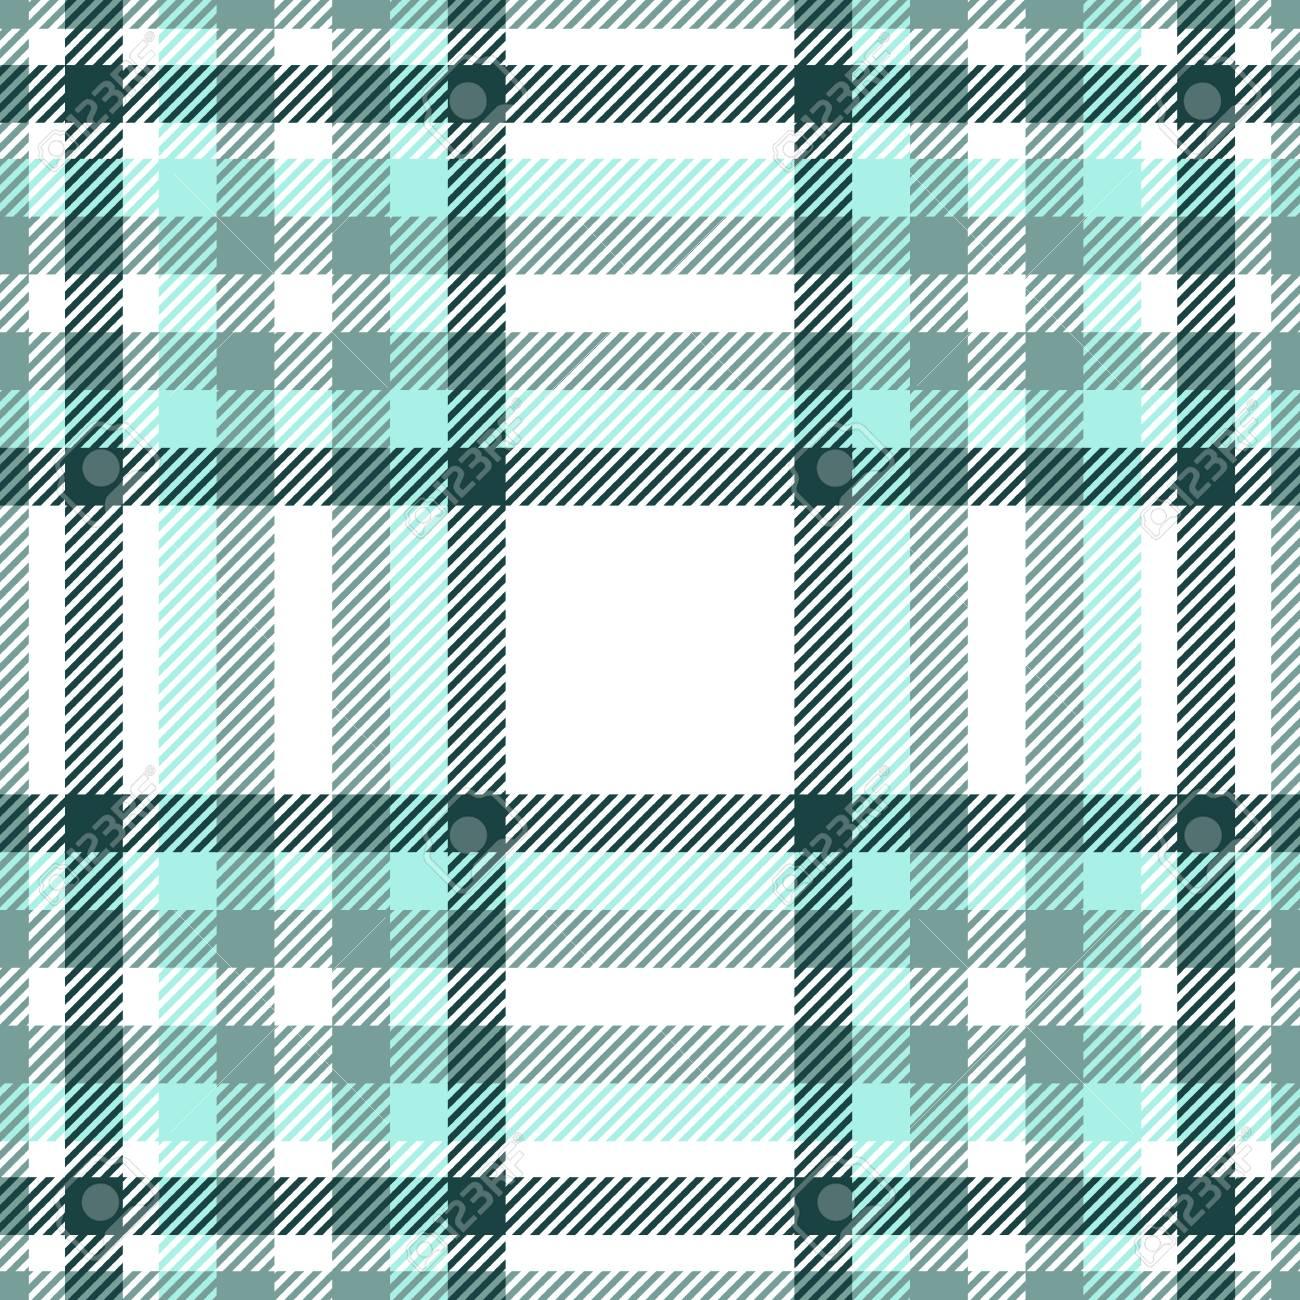 Plaid check pattern. Seamless checkered fabric texture. - 122854853